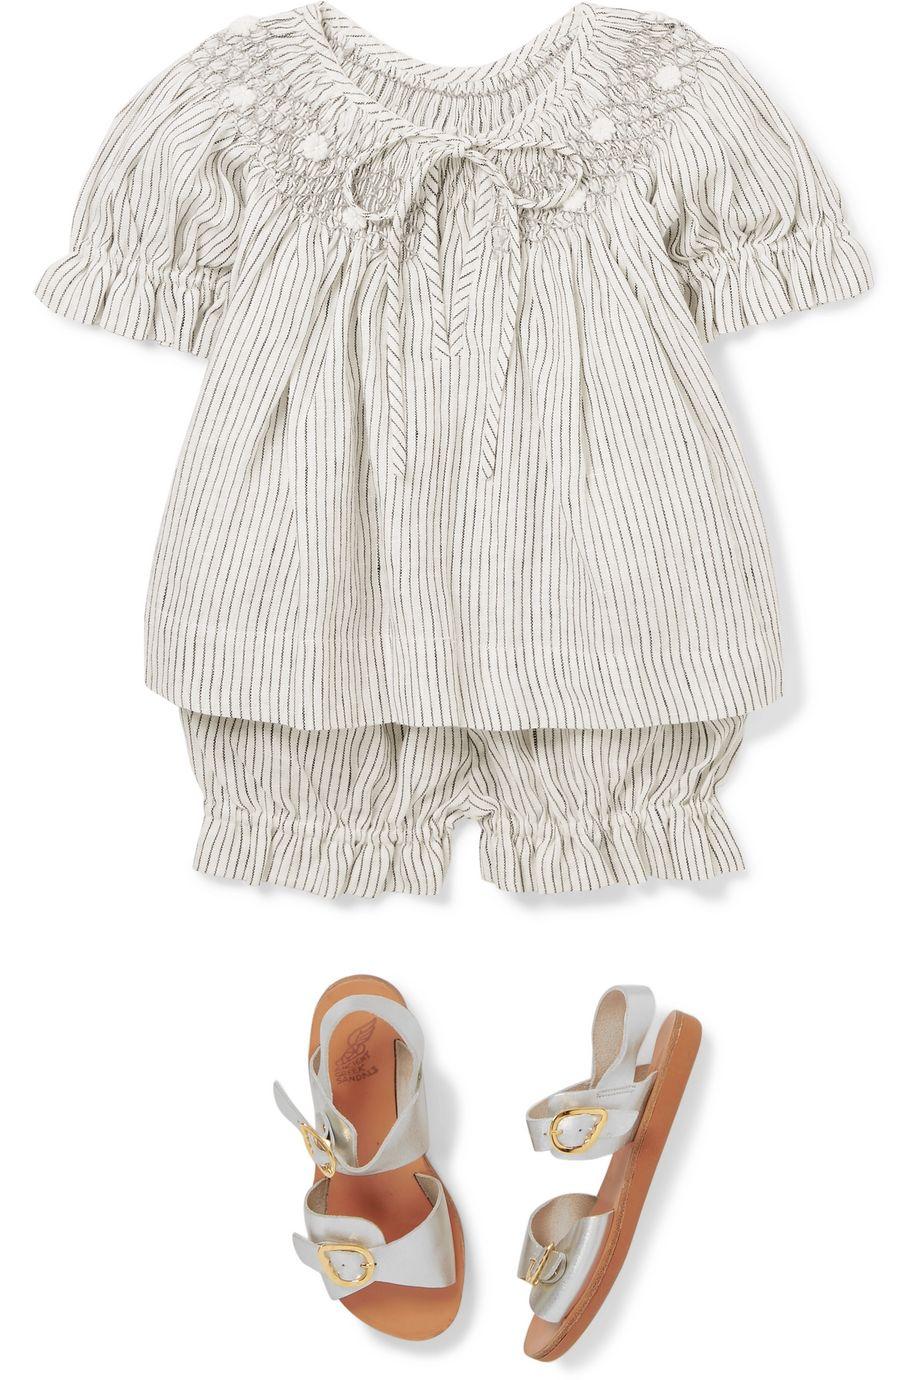 Innika Choo Kids Smocked striped linen blouse and shorts set